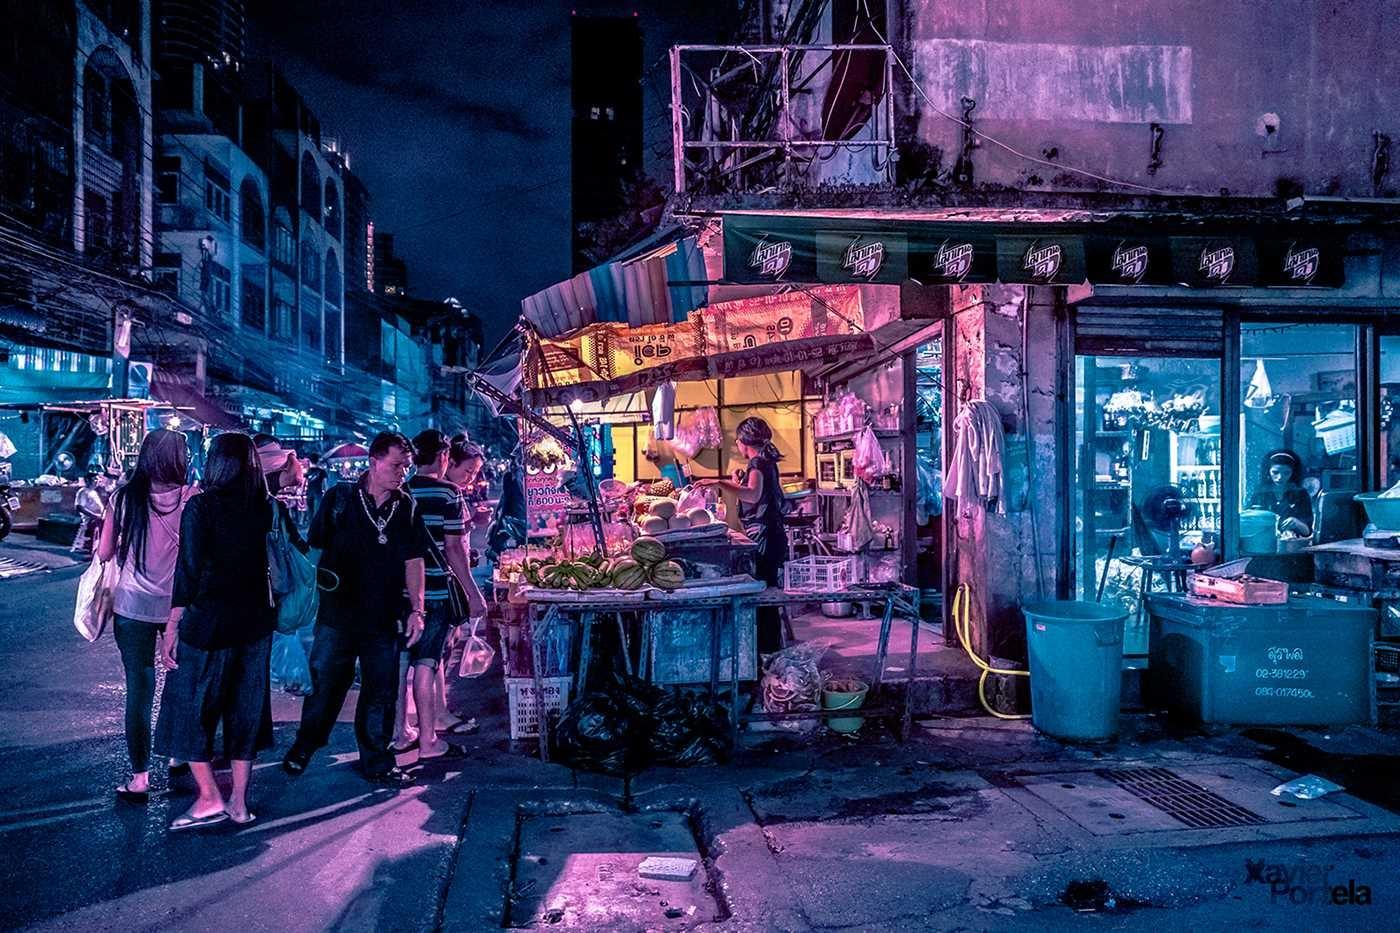 Glow: Photography Xavier Portel - photogrist   ello